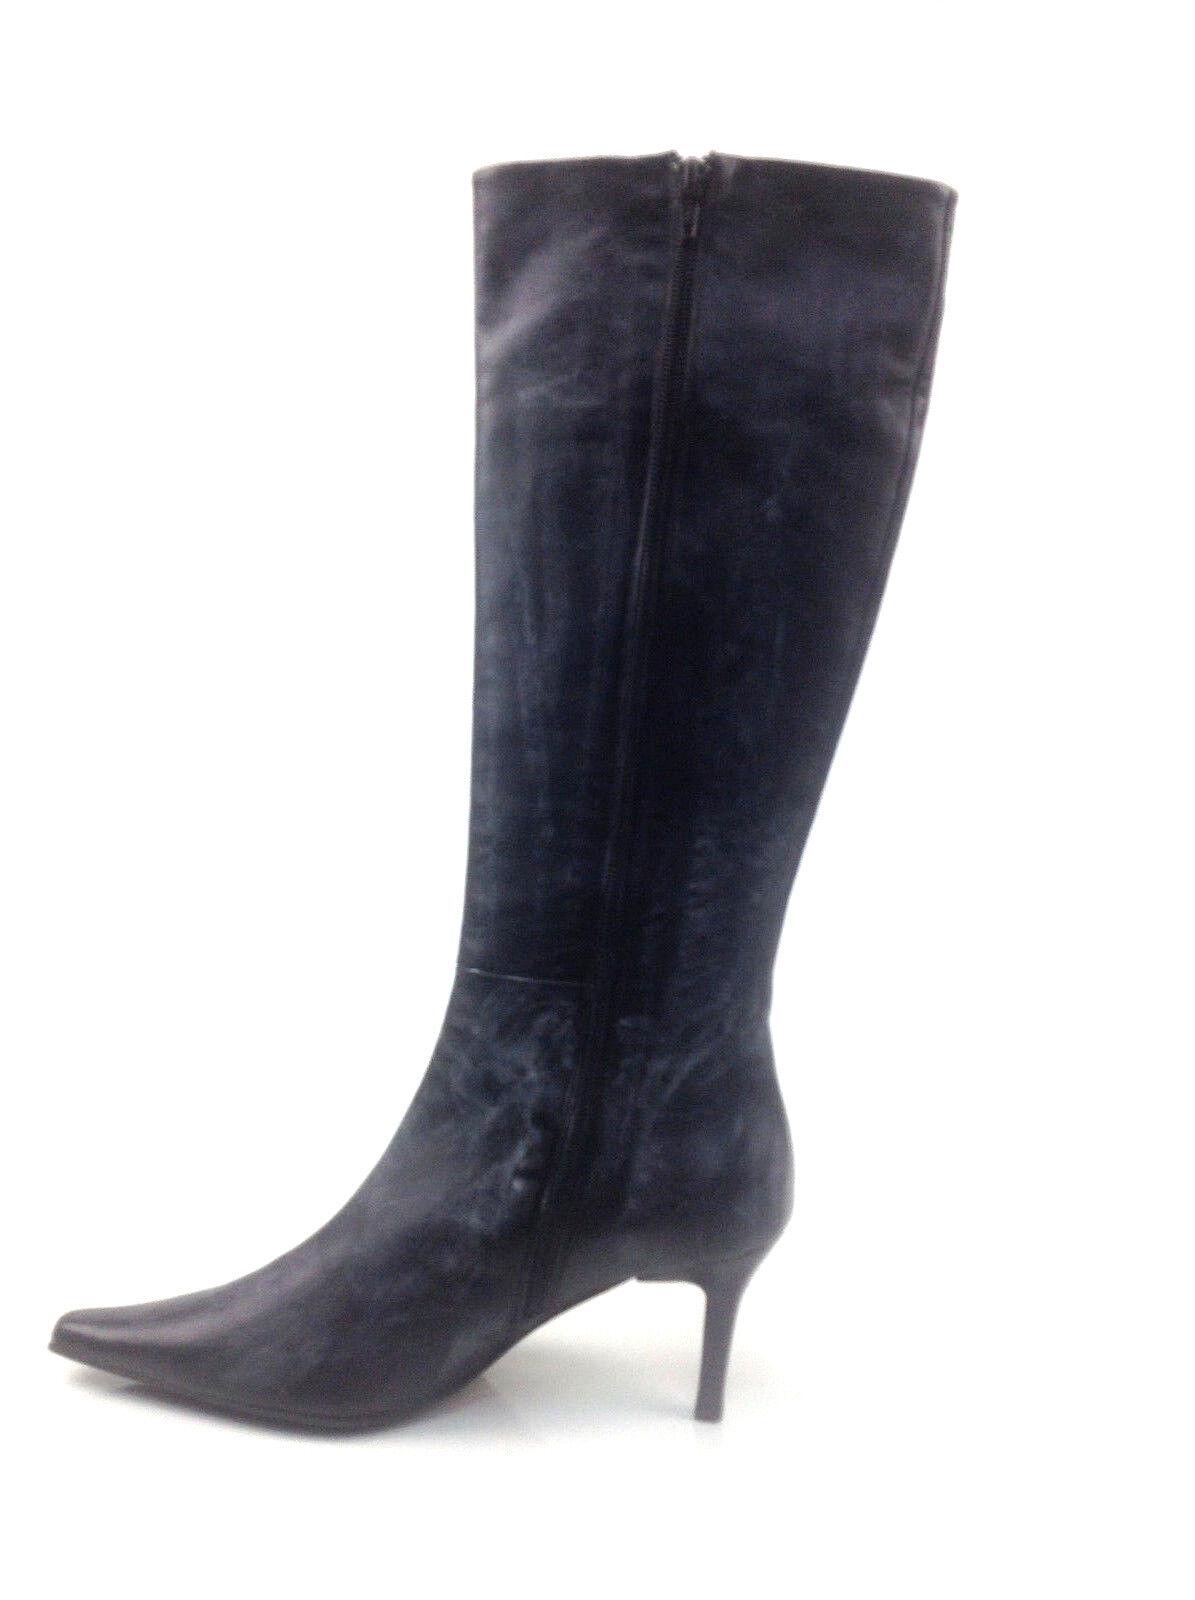 Versani Nappa black Hige Boots Size 6.5 US